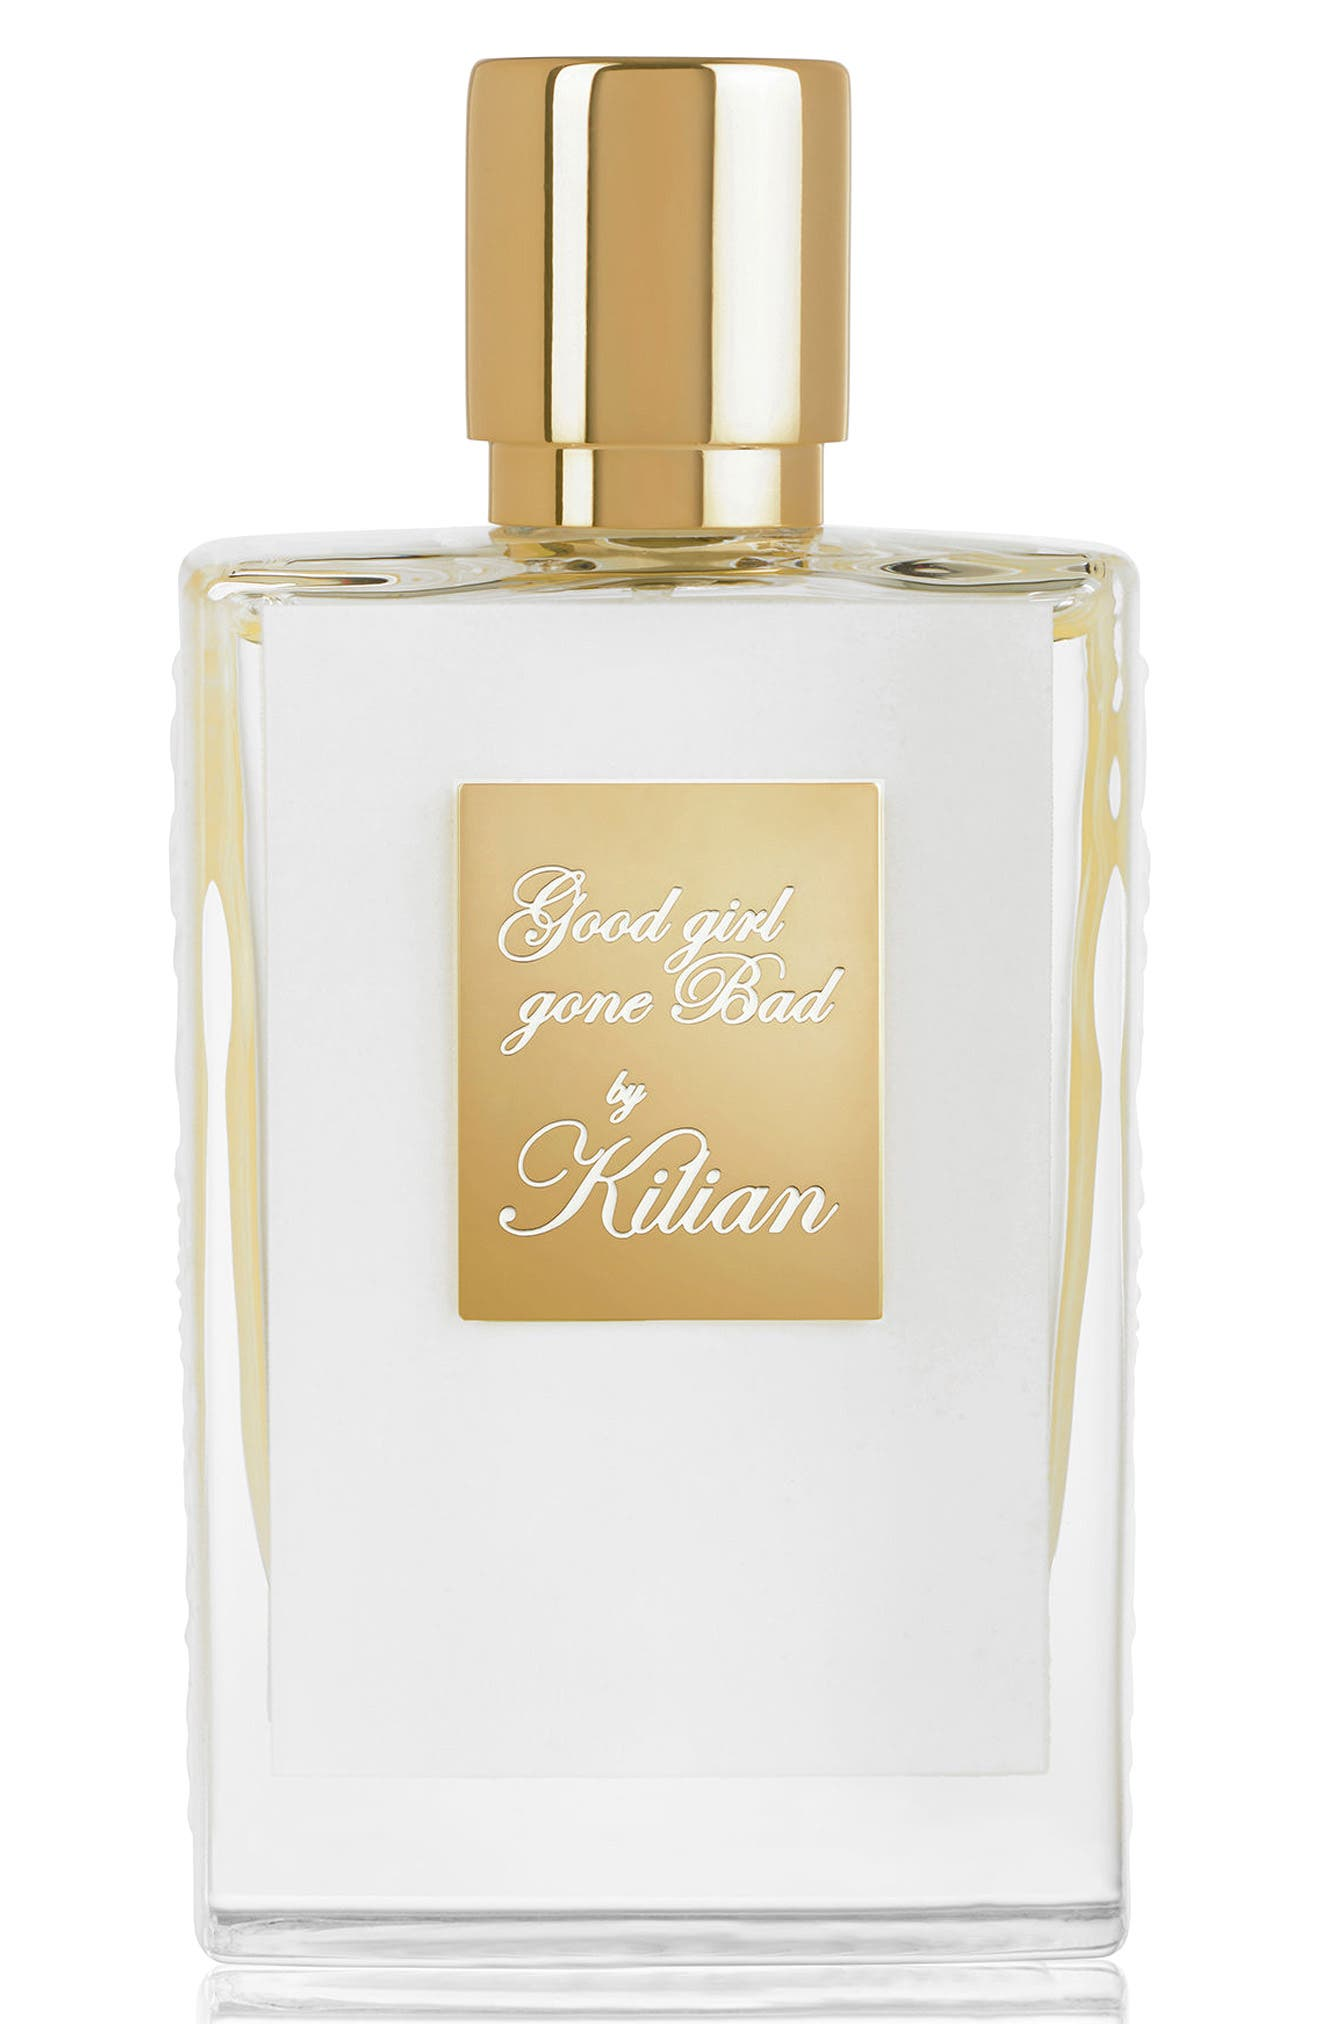 Kilian 'In the Garden of Good and Evil - Good Girl Gone Bad' Refillable Fragrance Spray